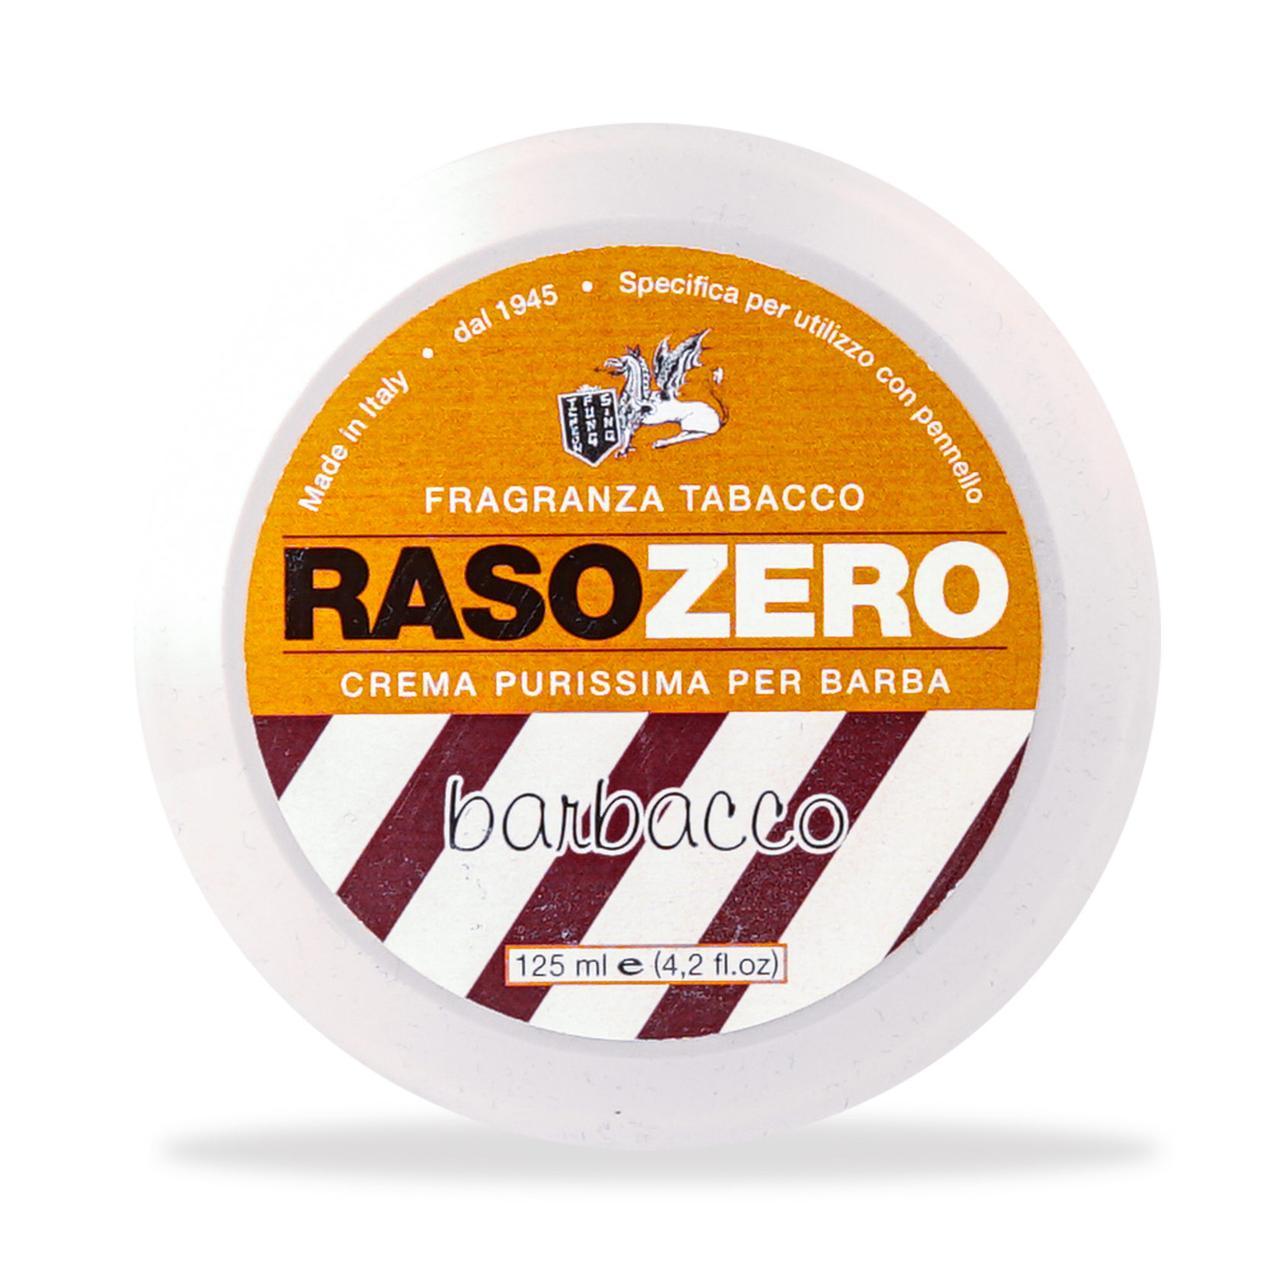 Крем для бритья Rasozero Barbacco Shaving Cream 125мл